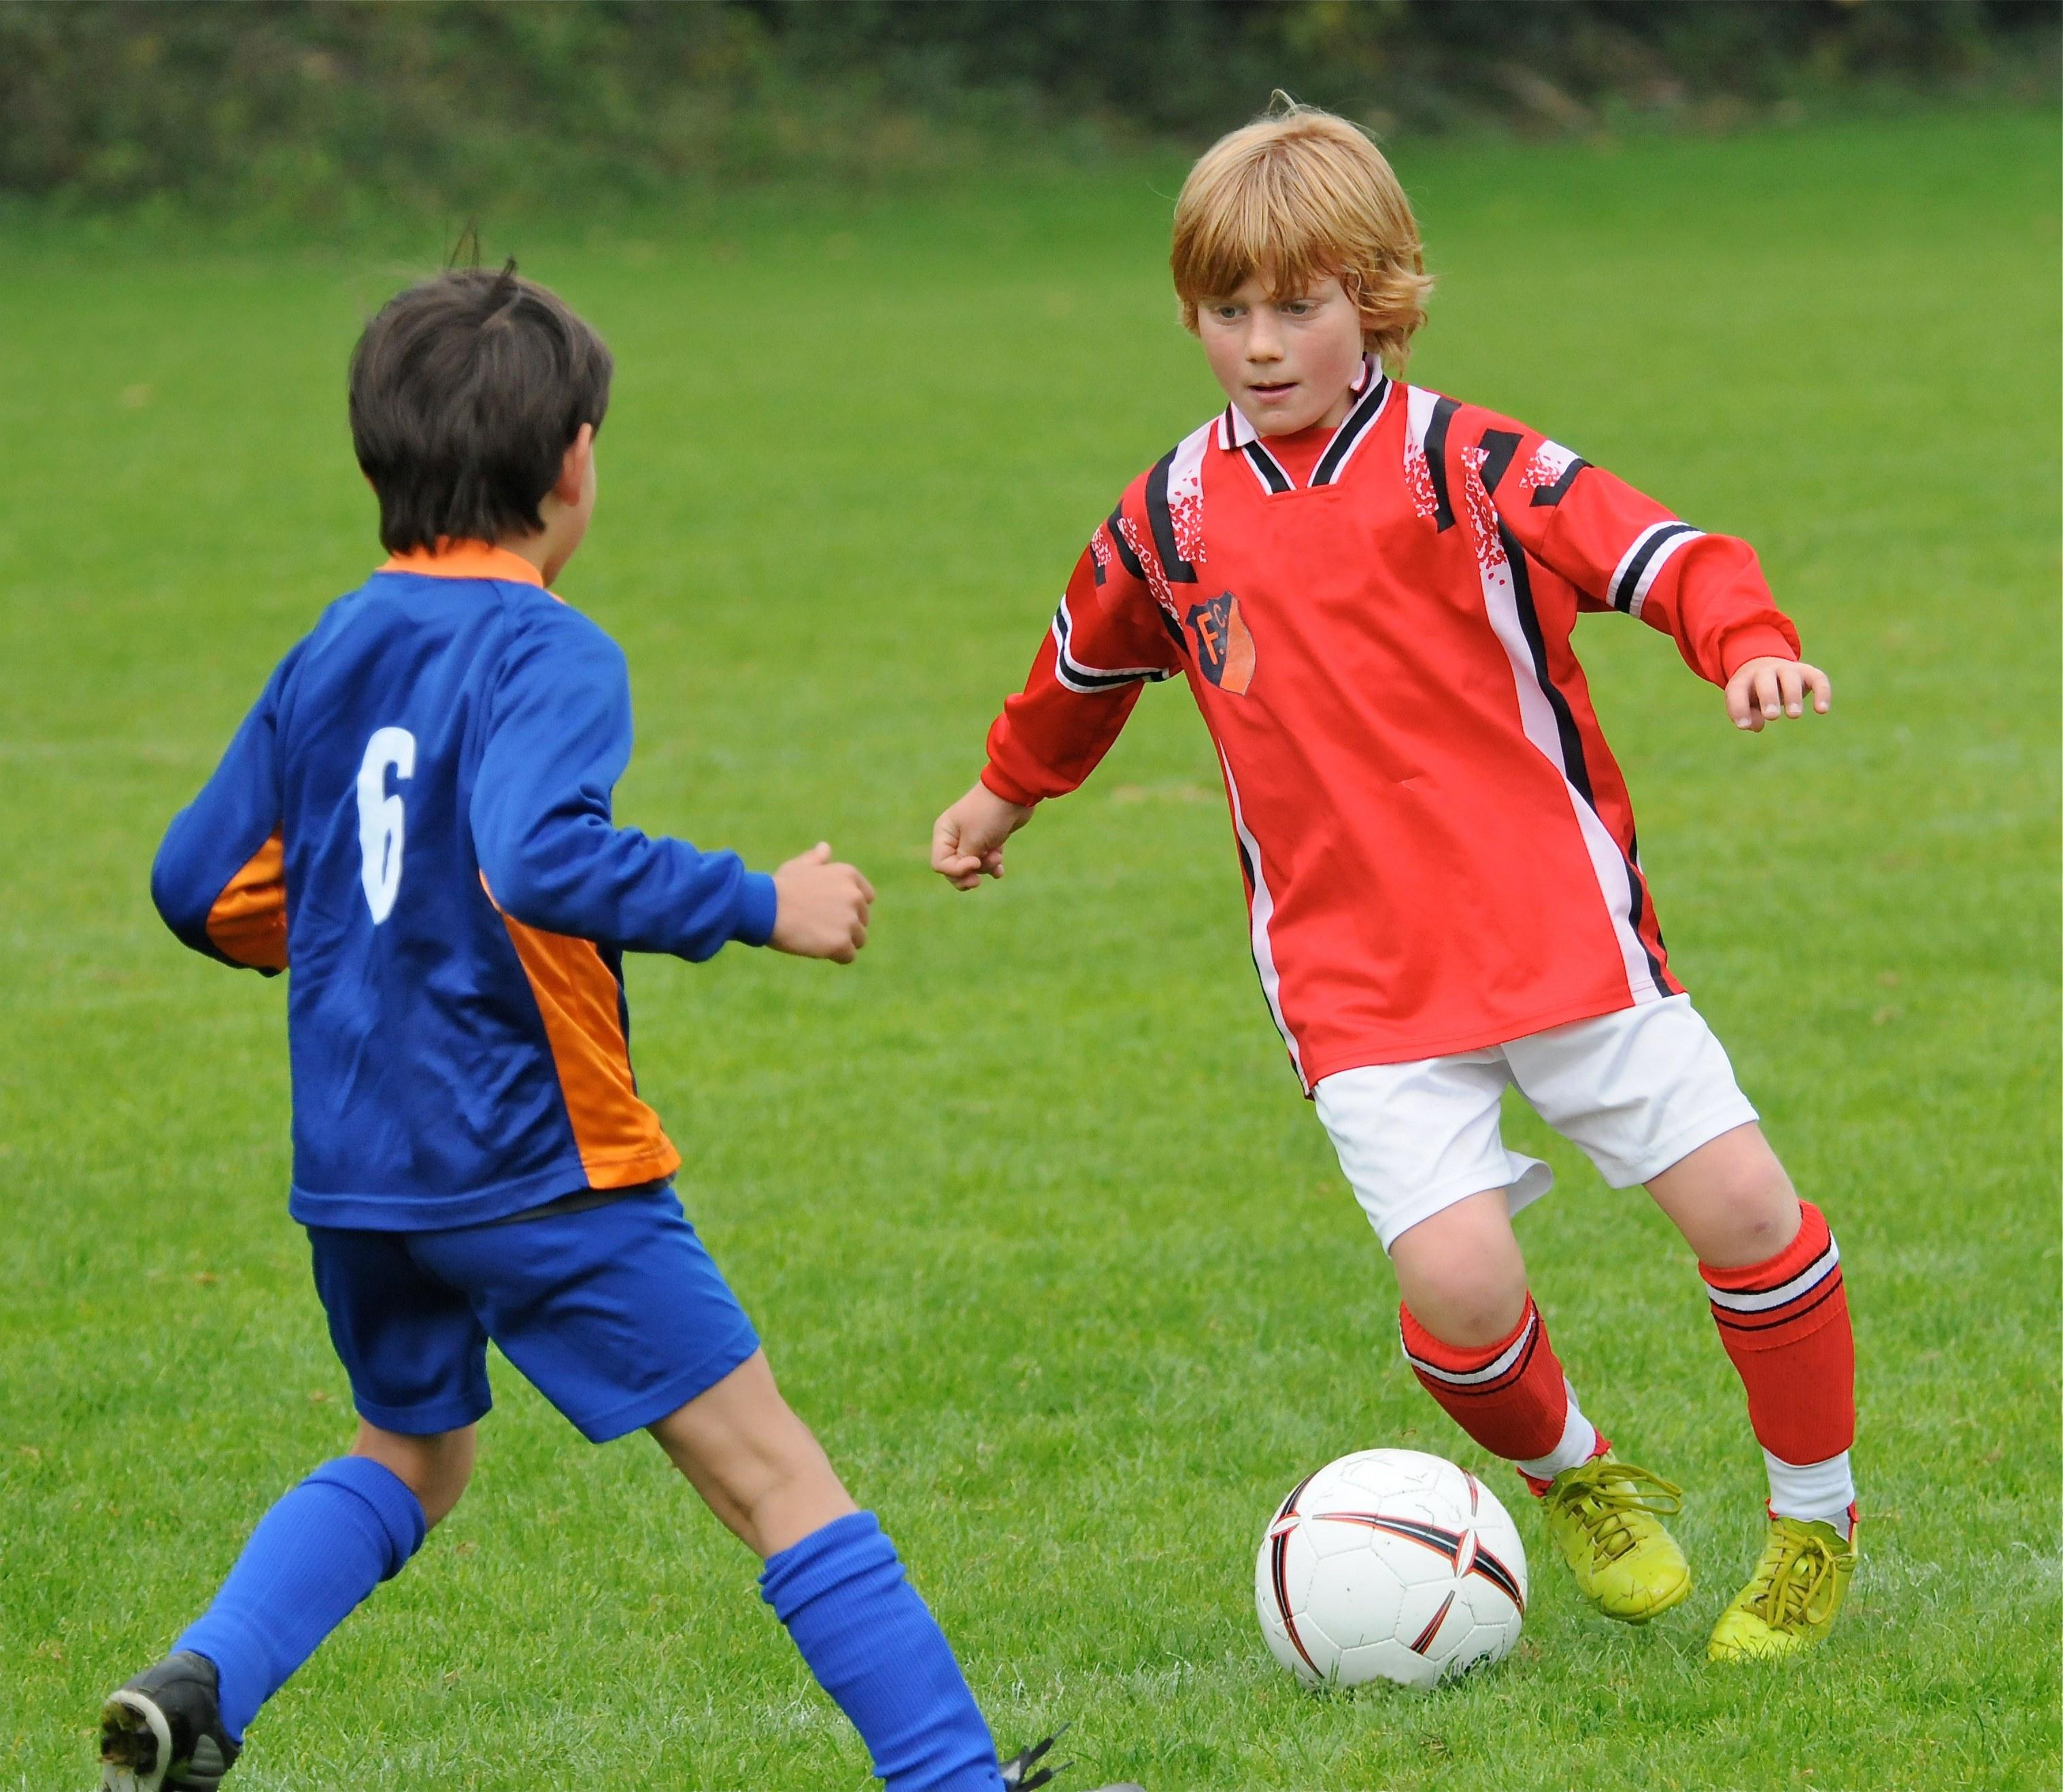 вопрос картинки про игру футбол плечу перевозка